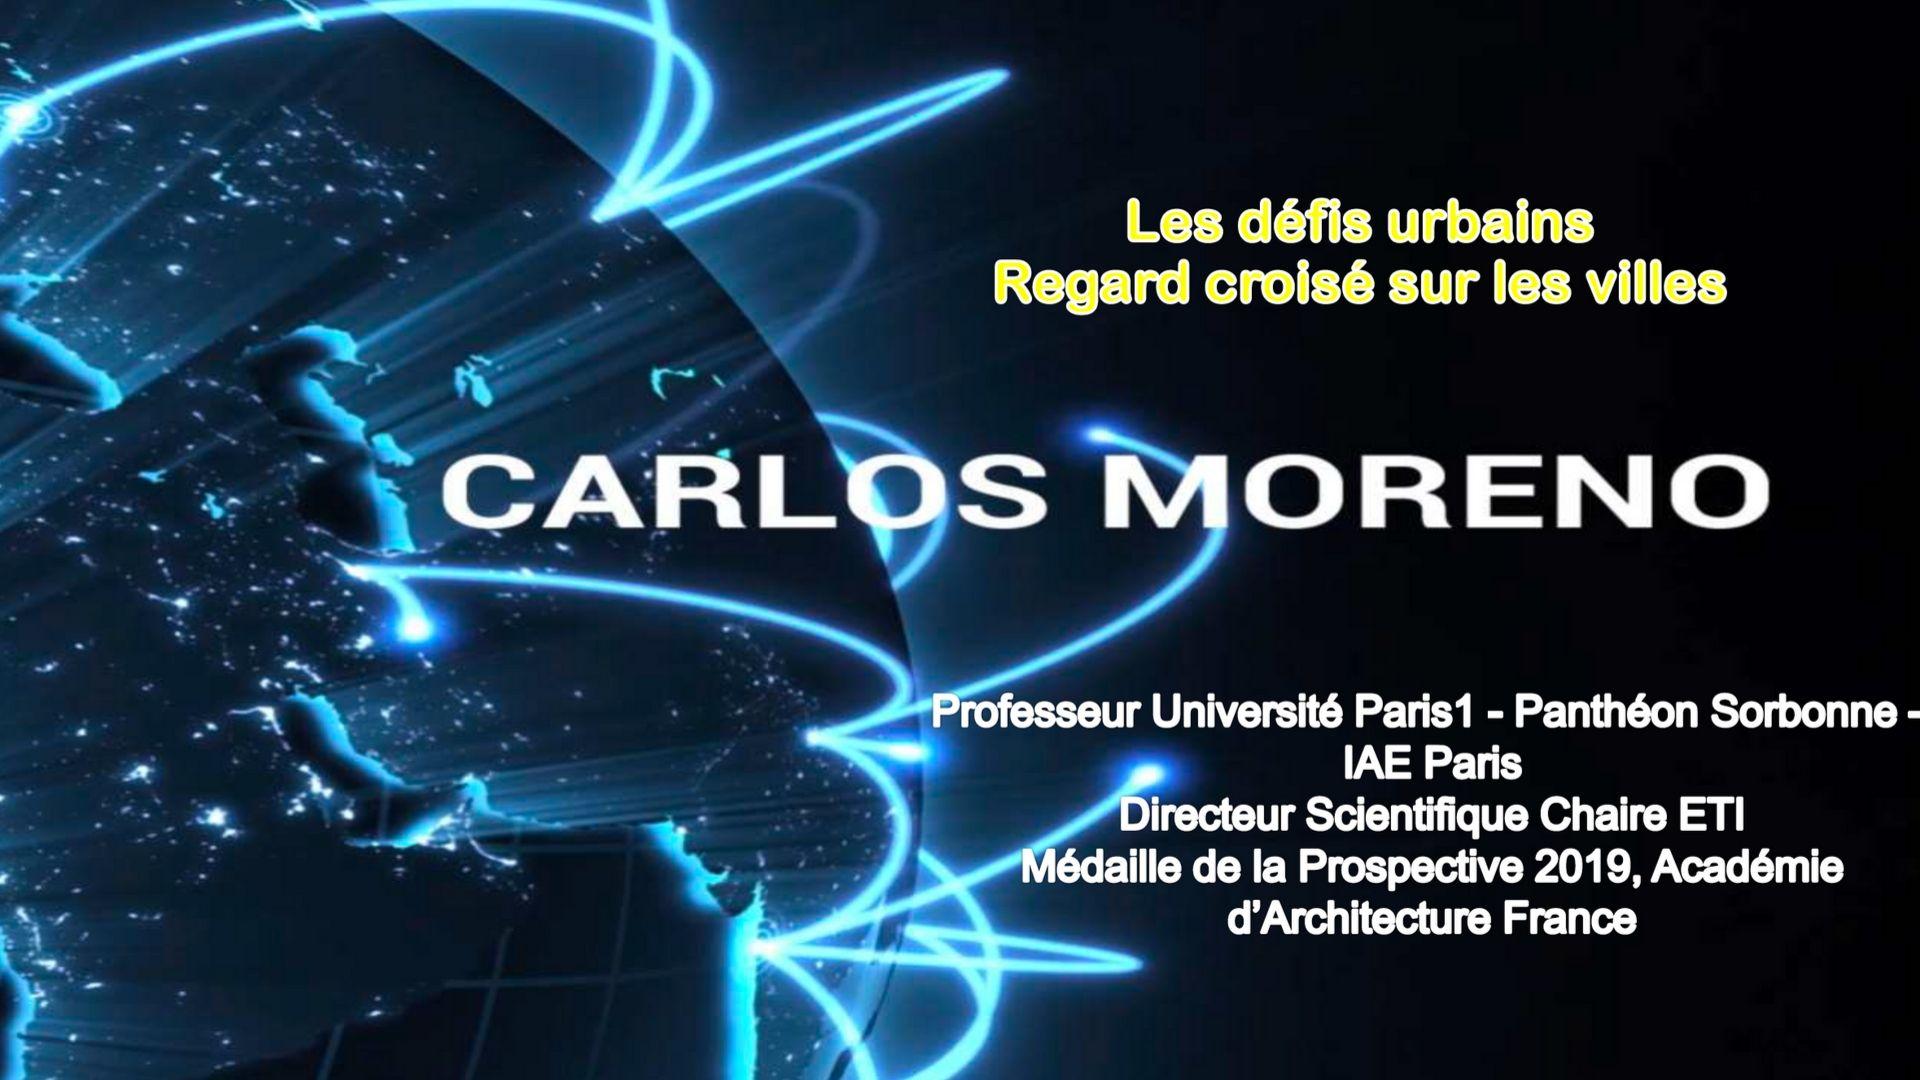 Présentation La Mélée 2019 - Carlos Moreno